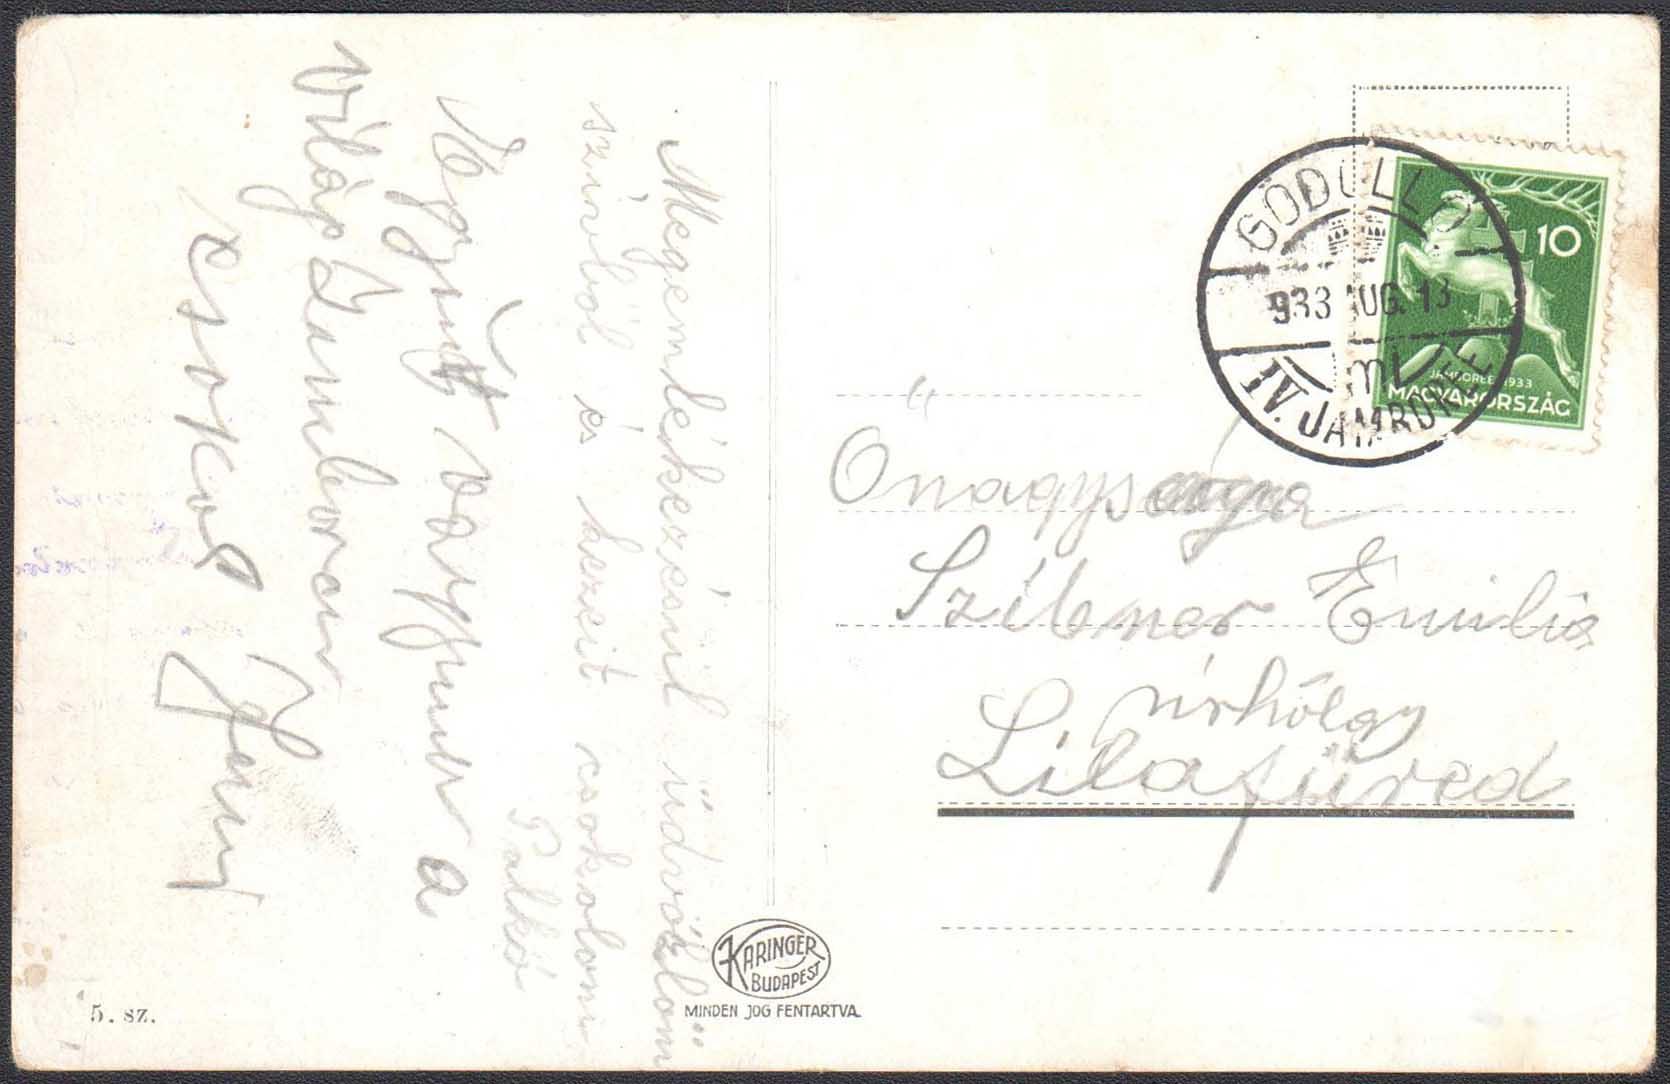 MA�ARSKO 1933 - IV. Skautsk� jamboree G�d�ll� 1933